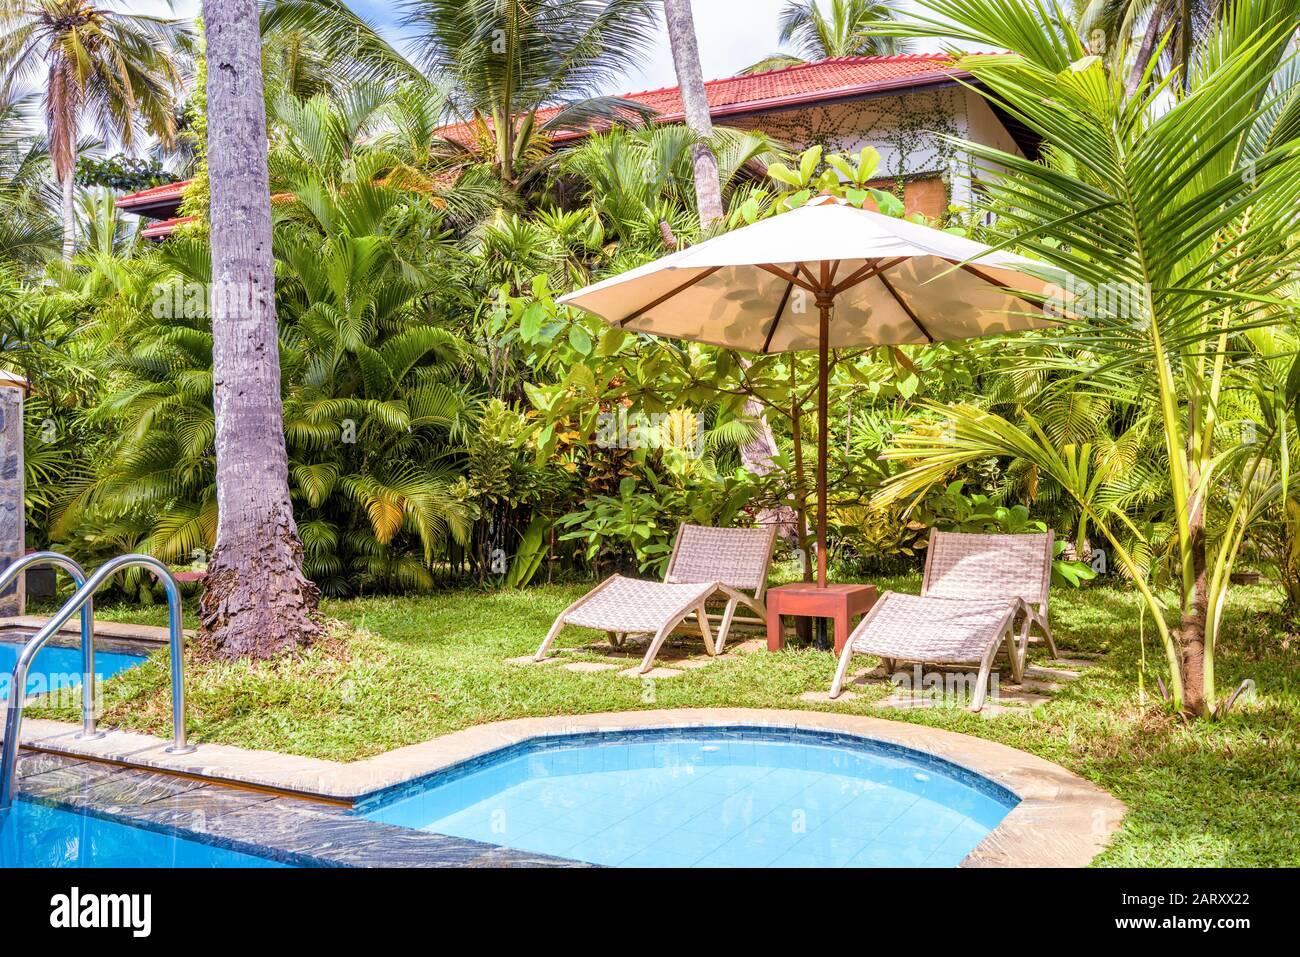 Pool Swimming Yard Home House Luxury Garden Water Stockfotos